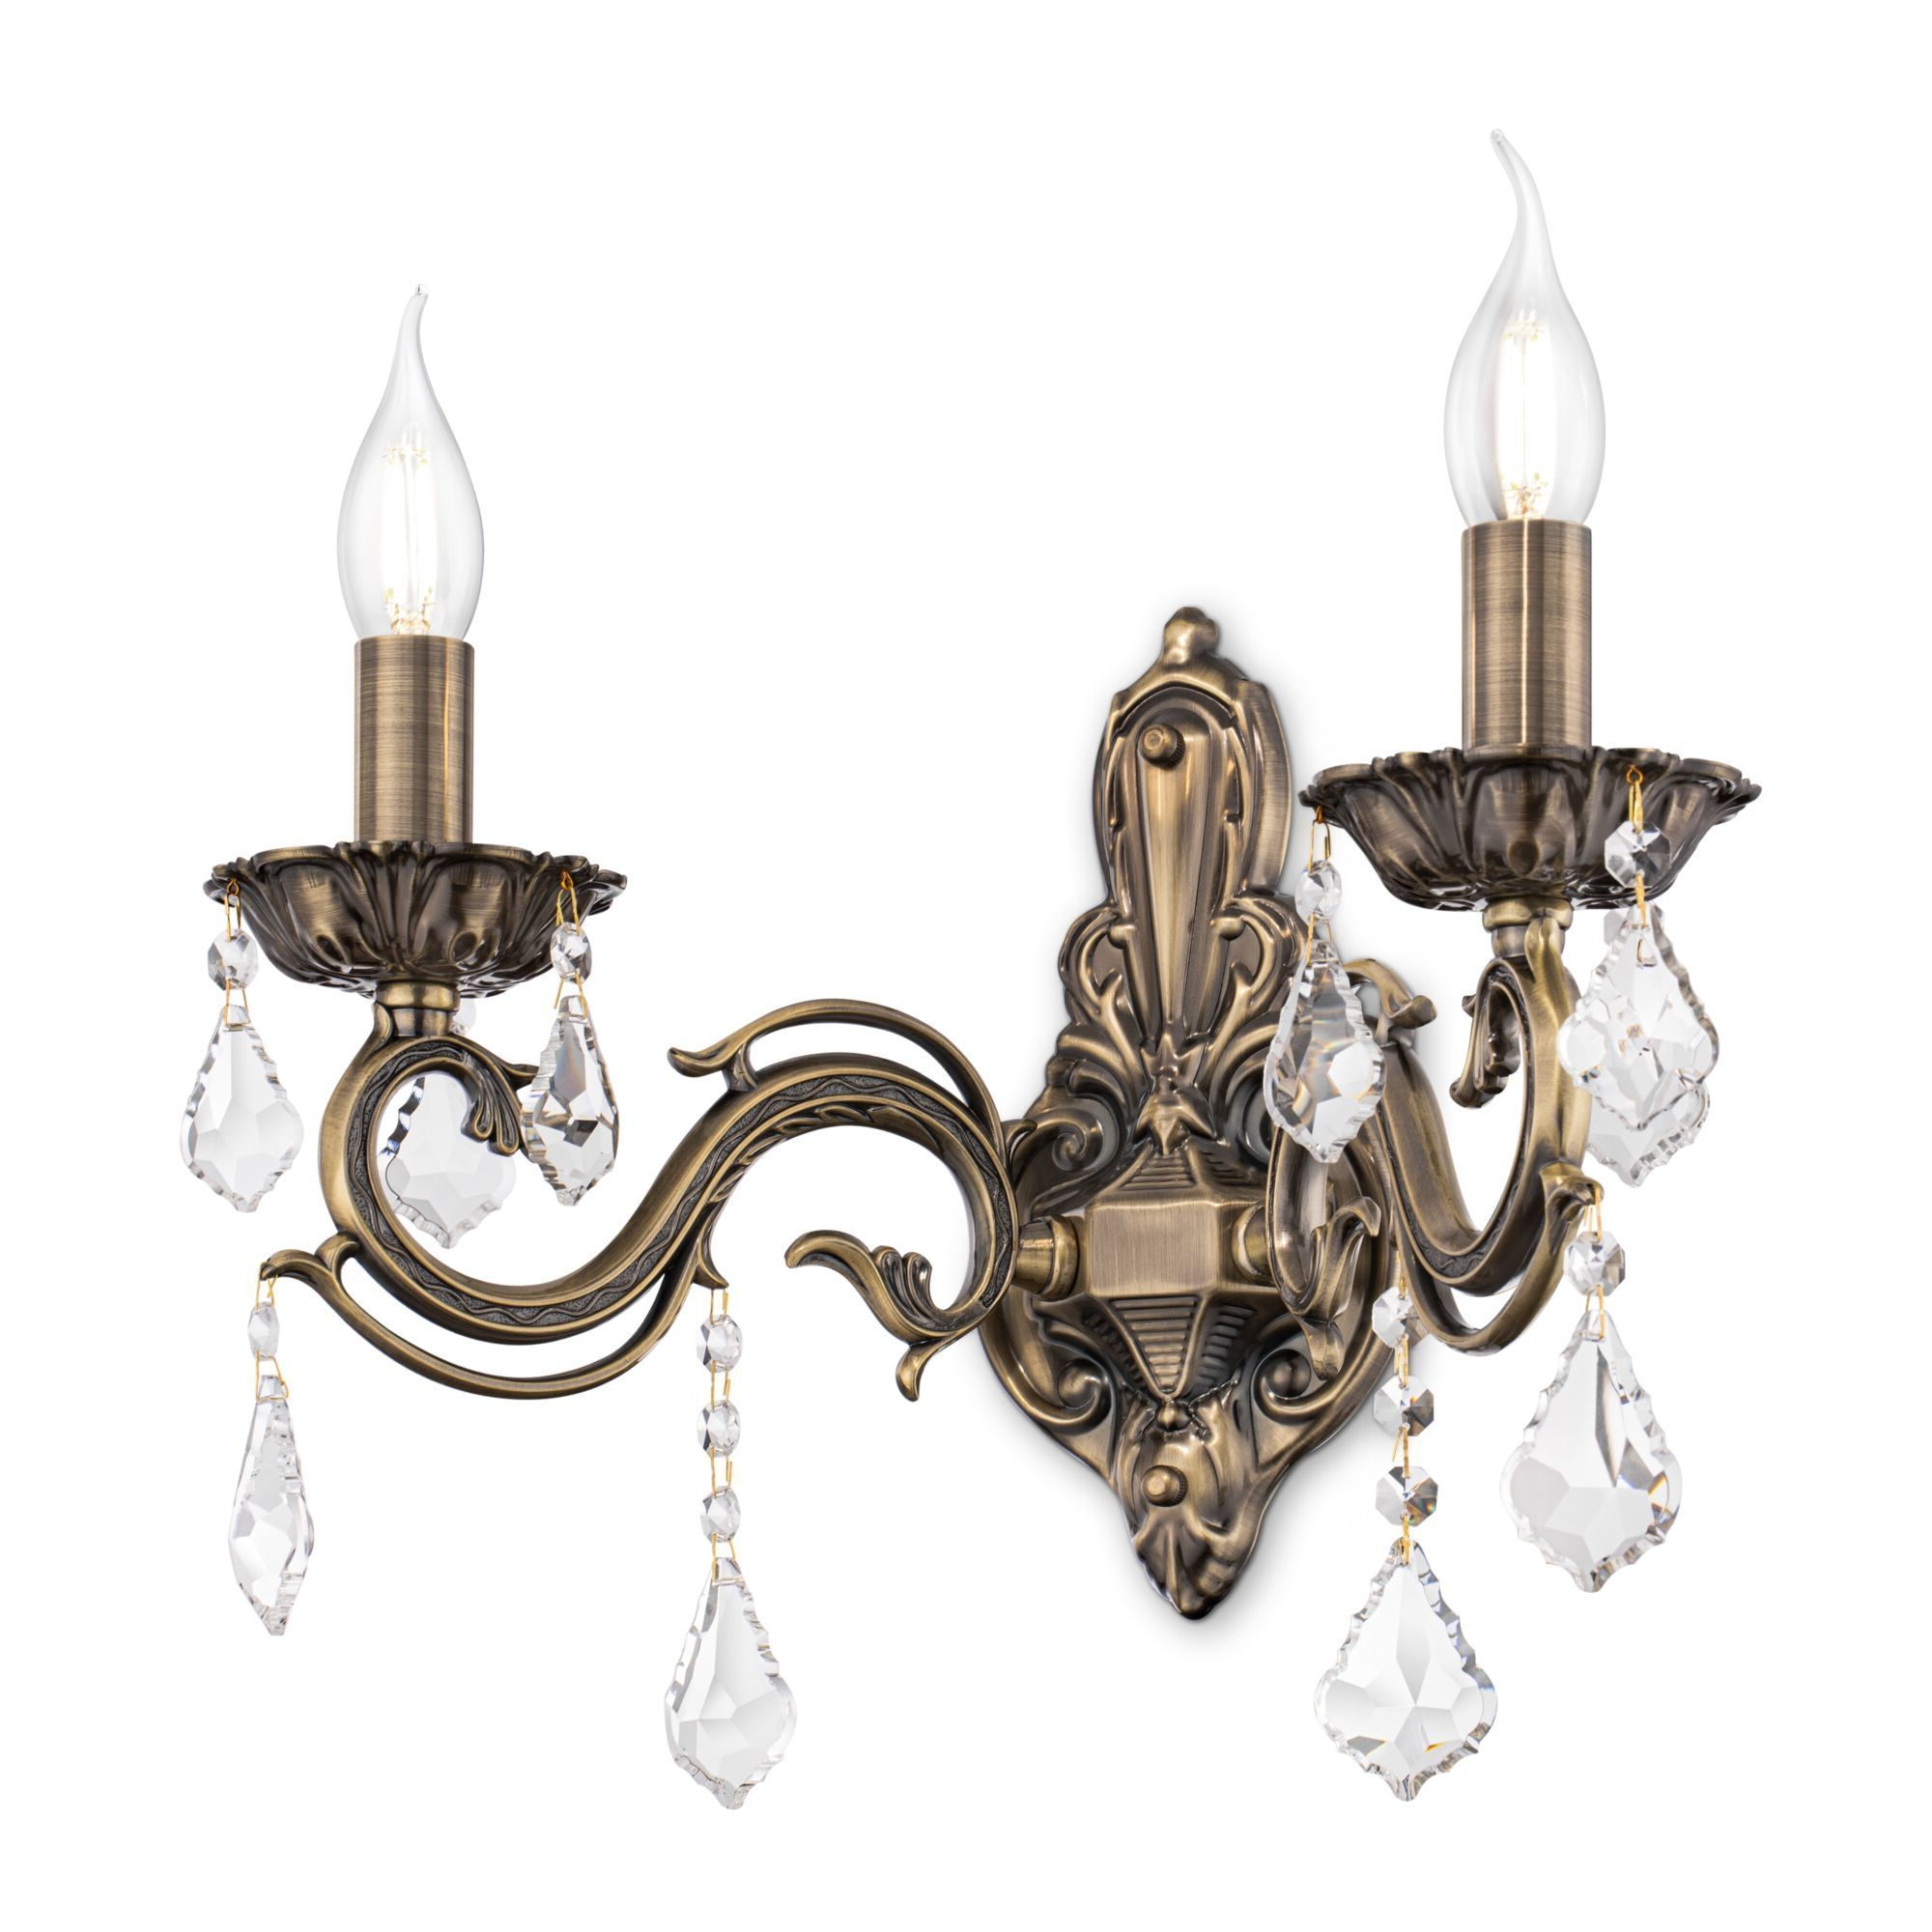 Бра Maytoni Bronze RC245-WL-02-R (arm245-02-r), 2xE14x60W, бронза, прозрачный, металл, стекло - фото 2